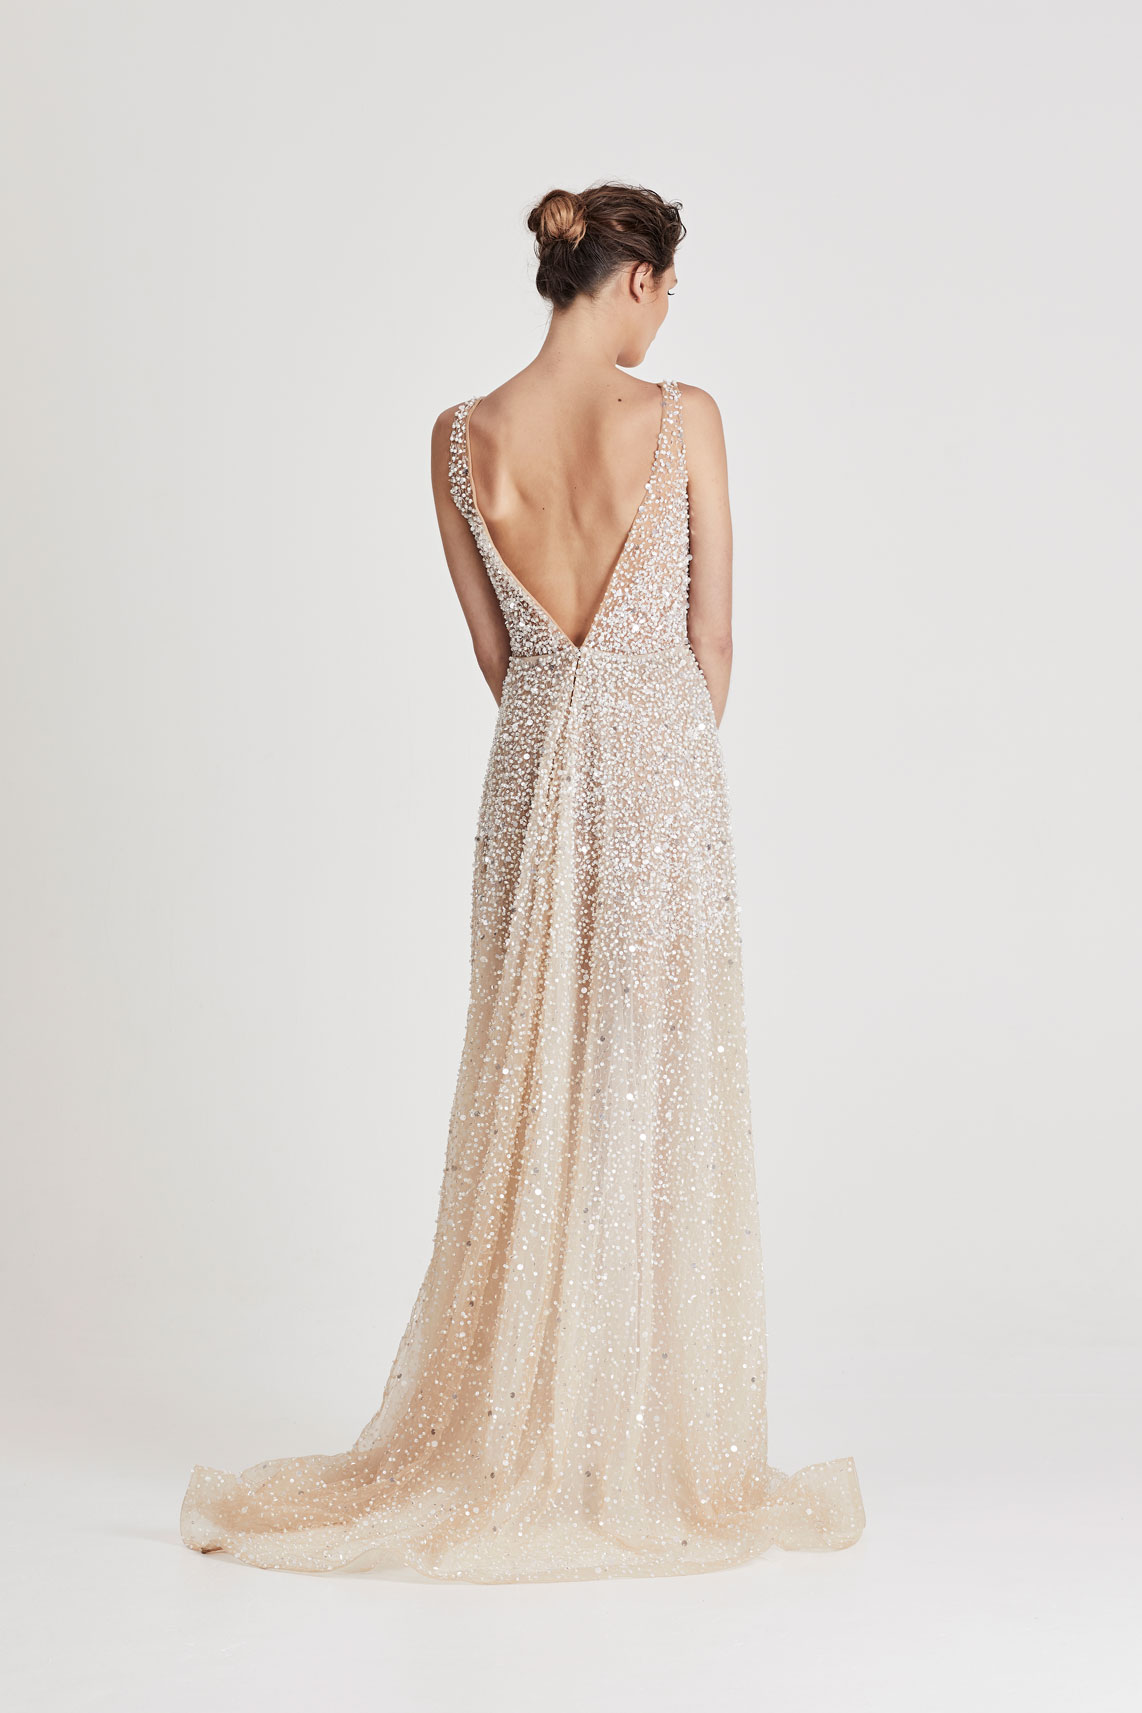 Chosen by One Day Peach dress | Wedding Dresses under $7,500 | LOVE FIND CO. Bridal Directory